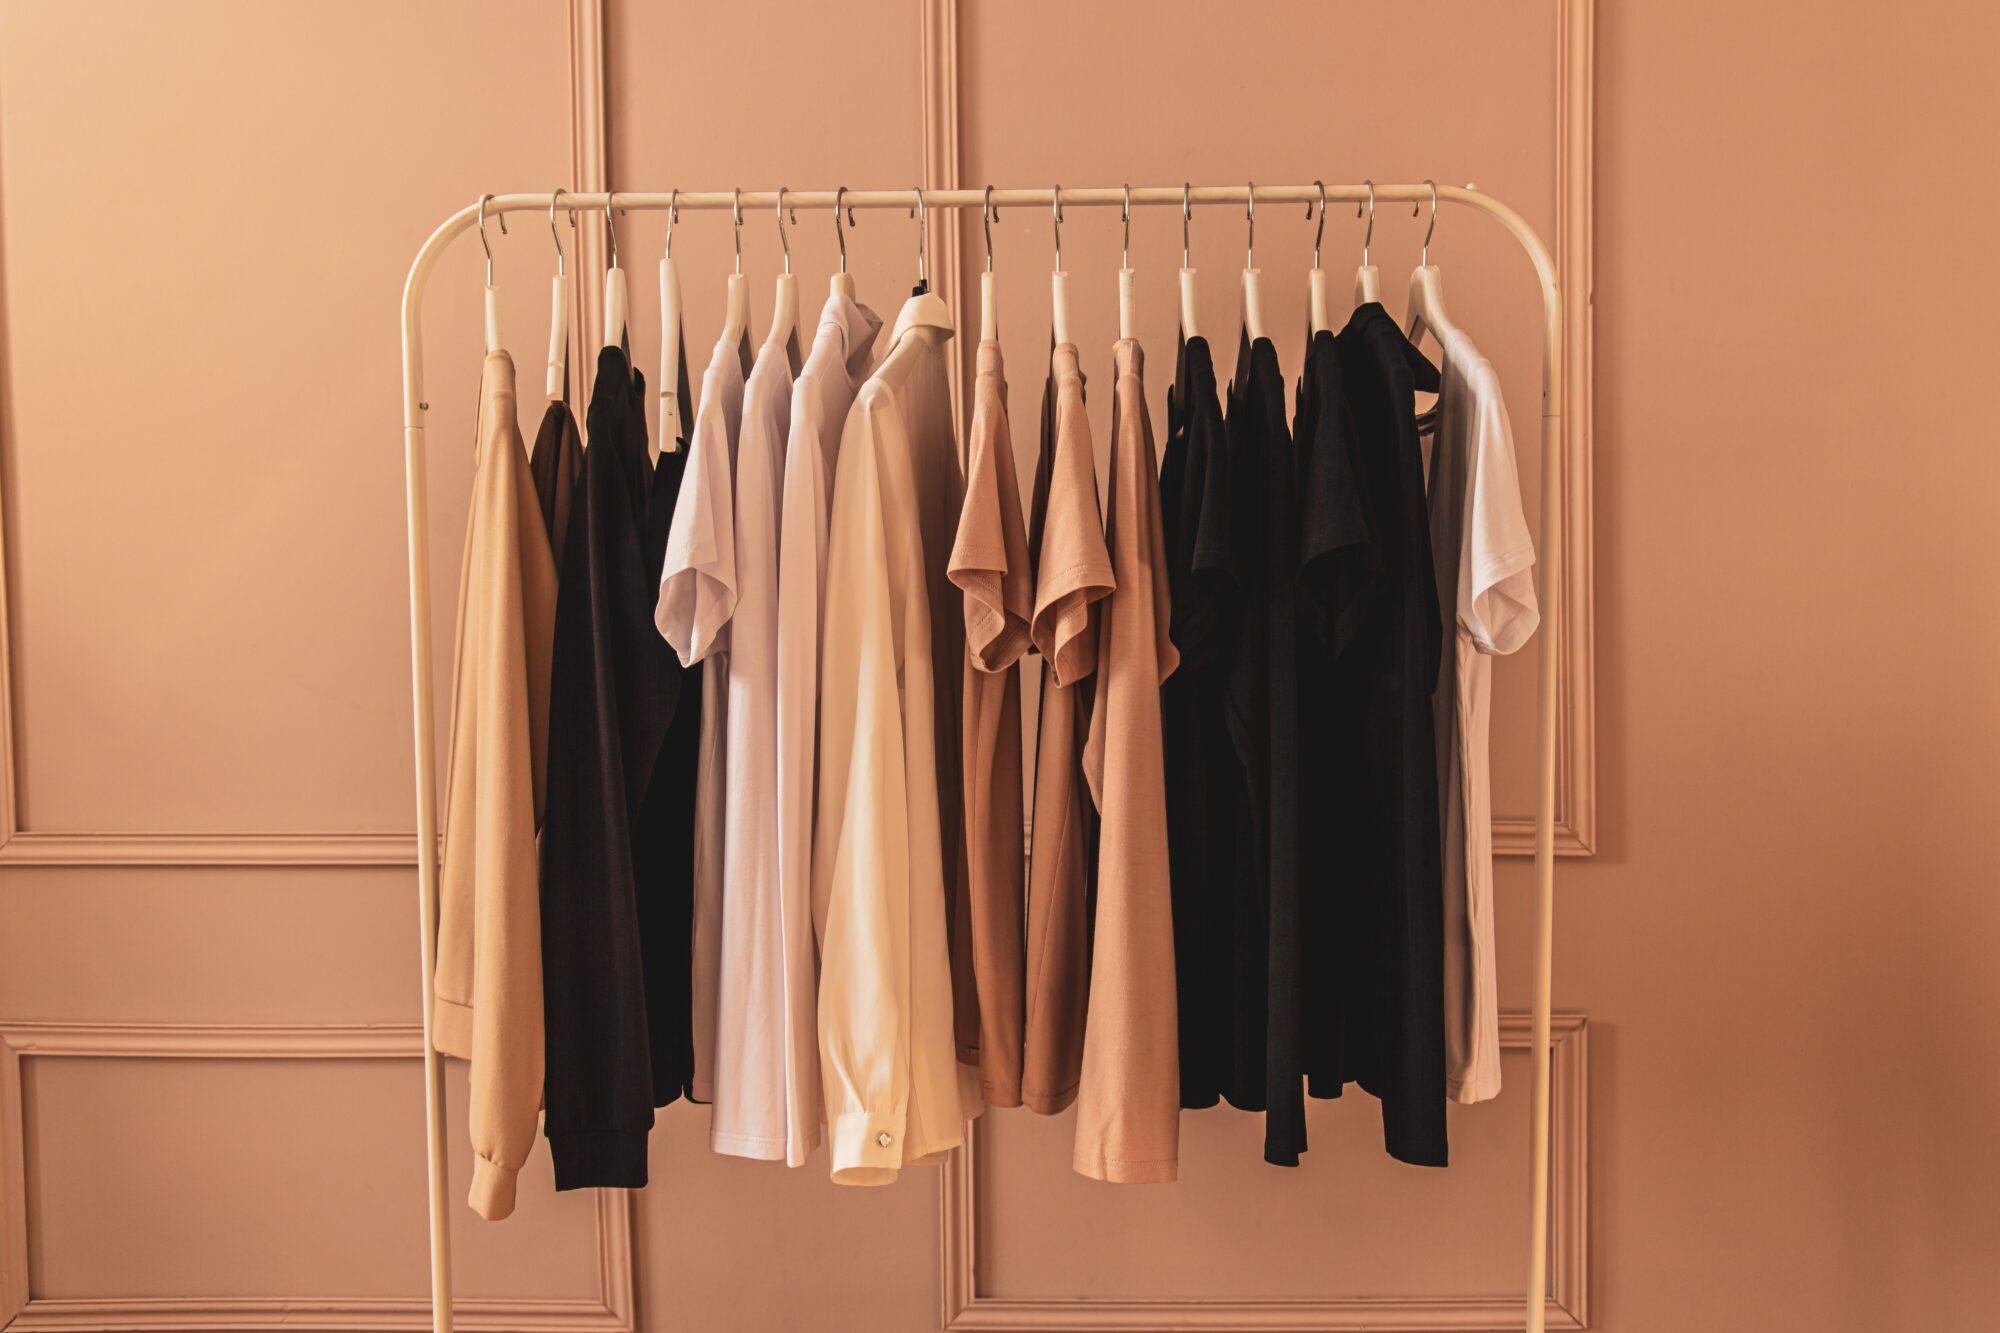 Hvordan gør jeg min garderobe mere bæredygtig?